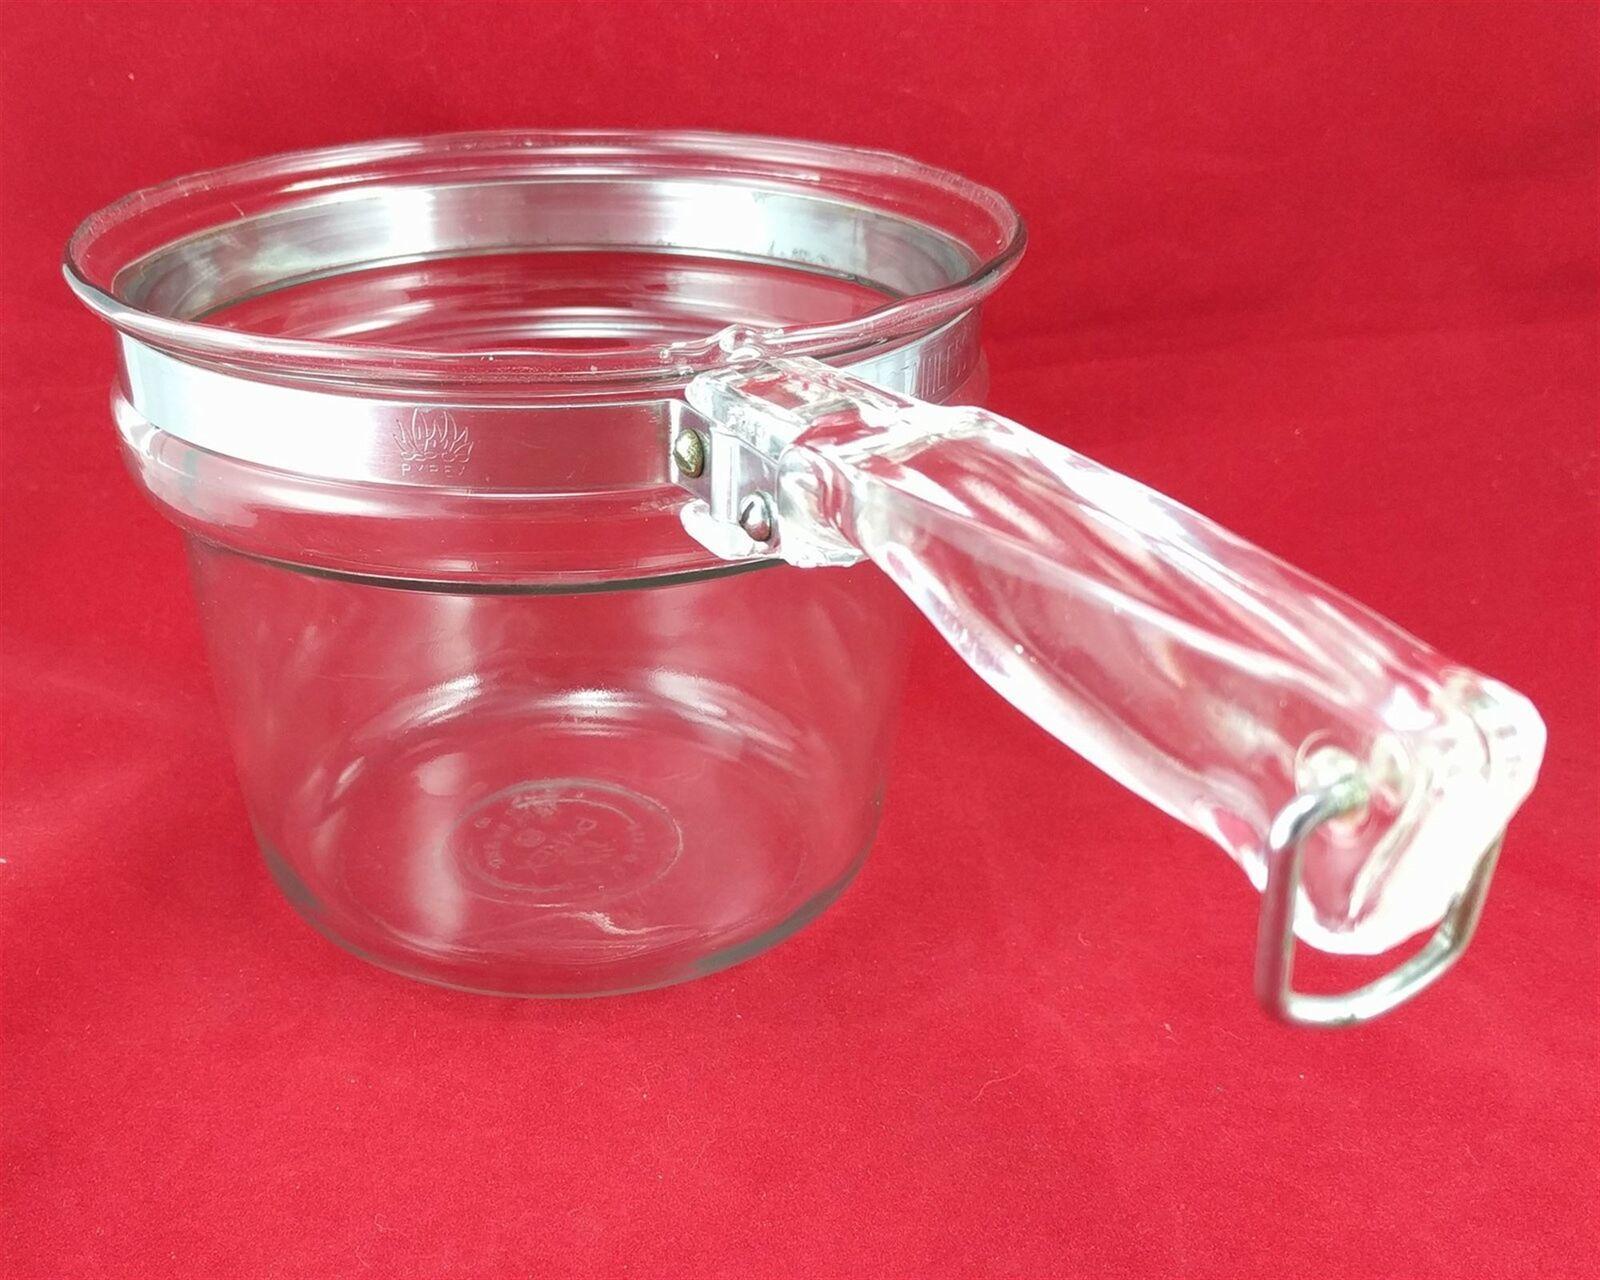 Pyrex Flameware 6283U 1½ qt Vintage Glass Saucepan w/ Stainless Steel Band image 2